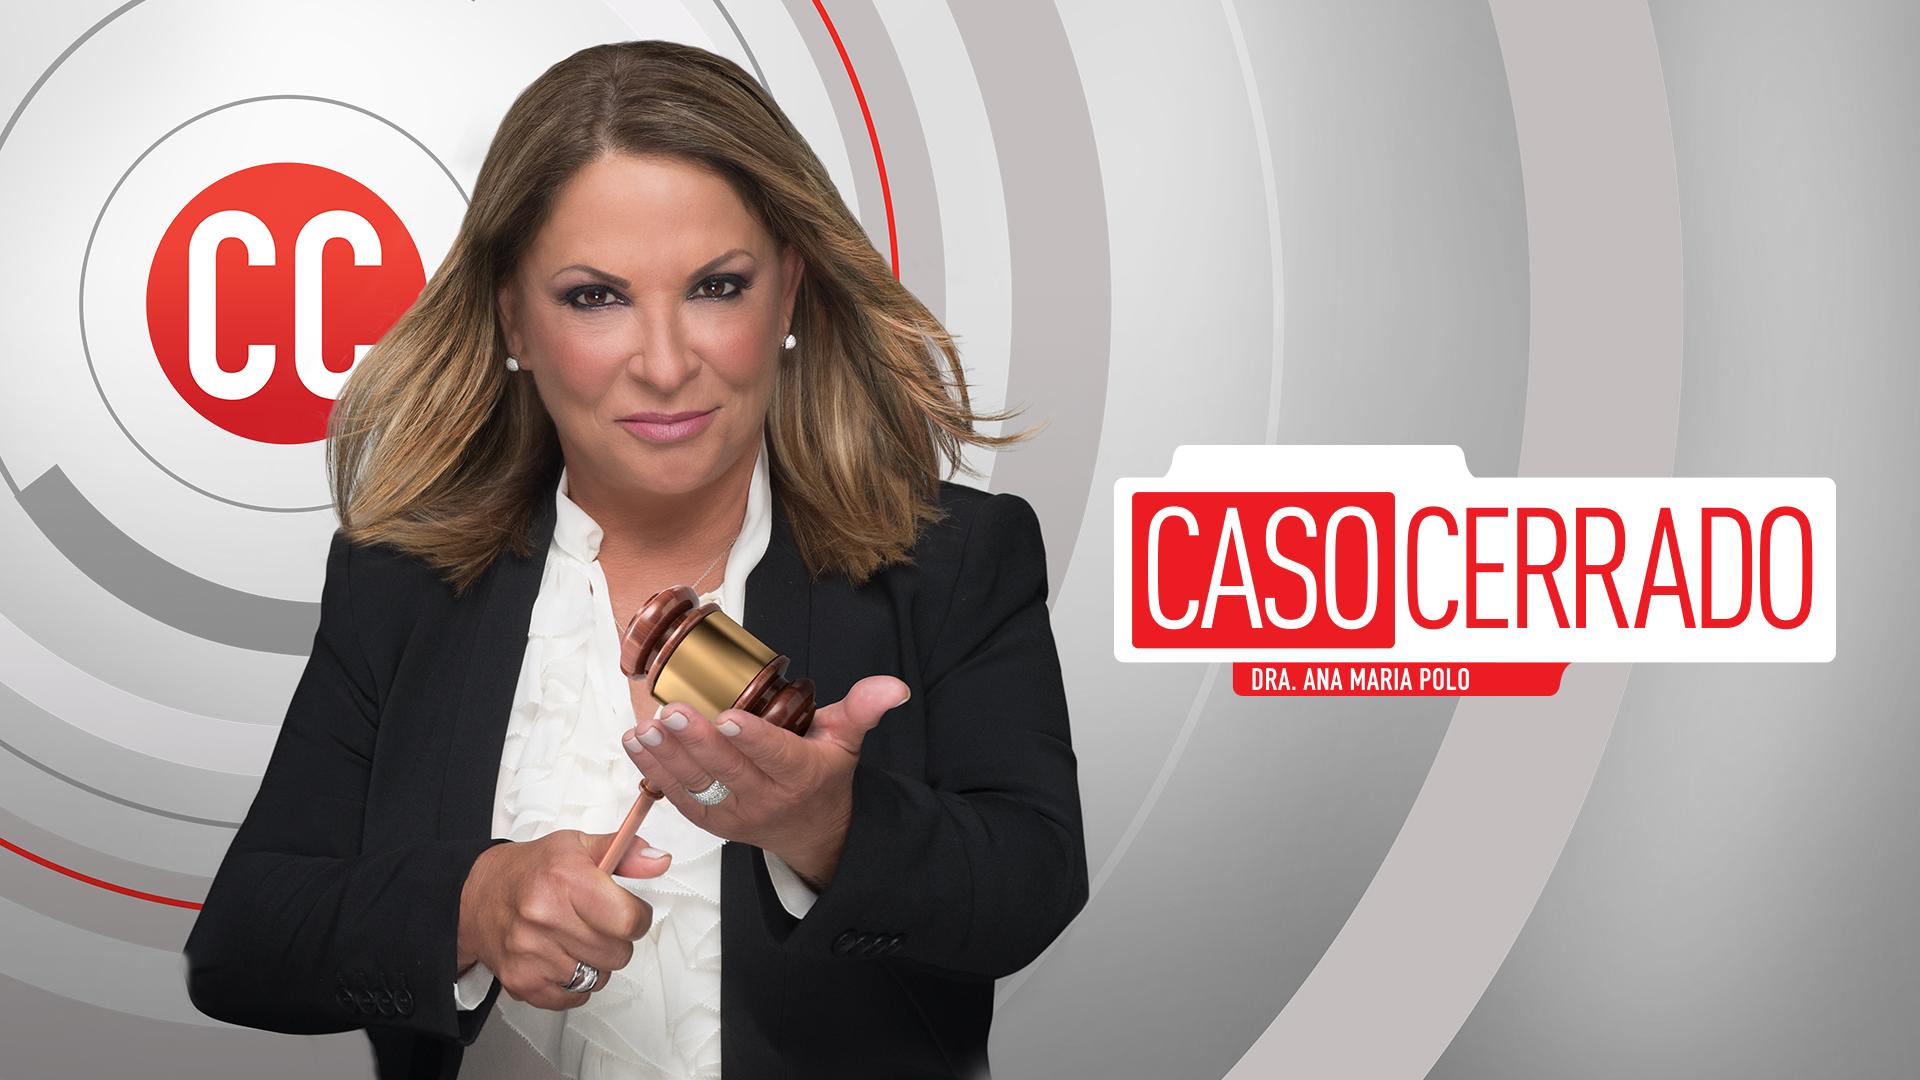 Caso Cerrado Con La Doctora Polo Episodios Casos Videos Telemundo